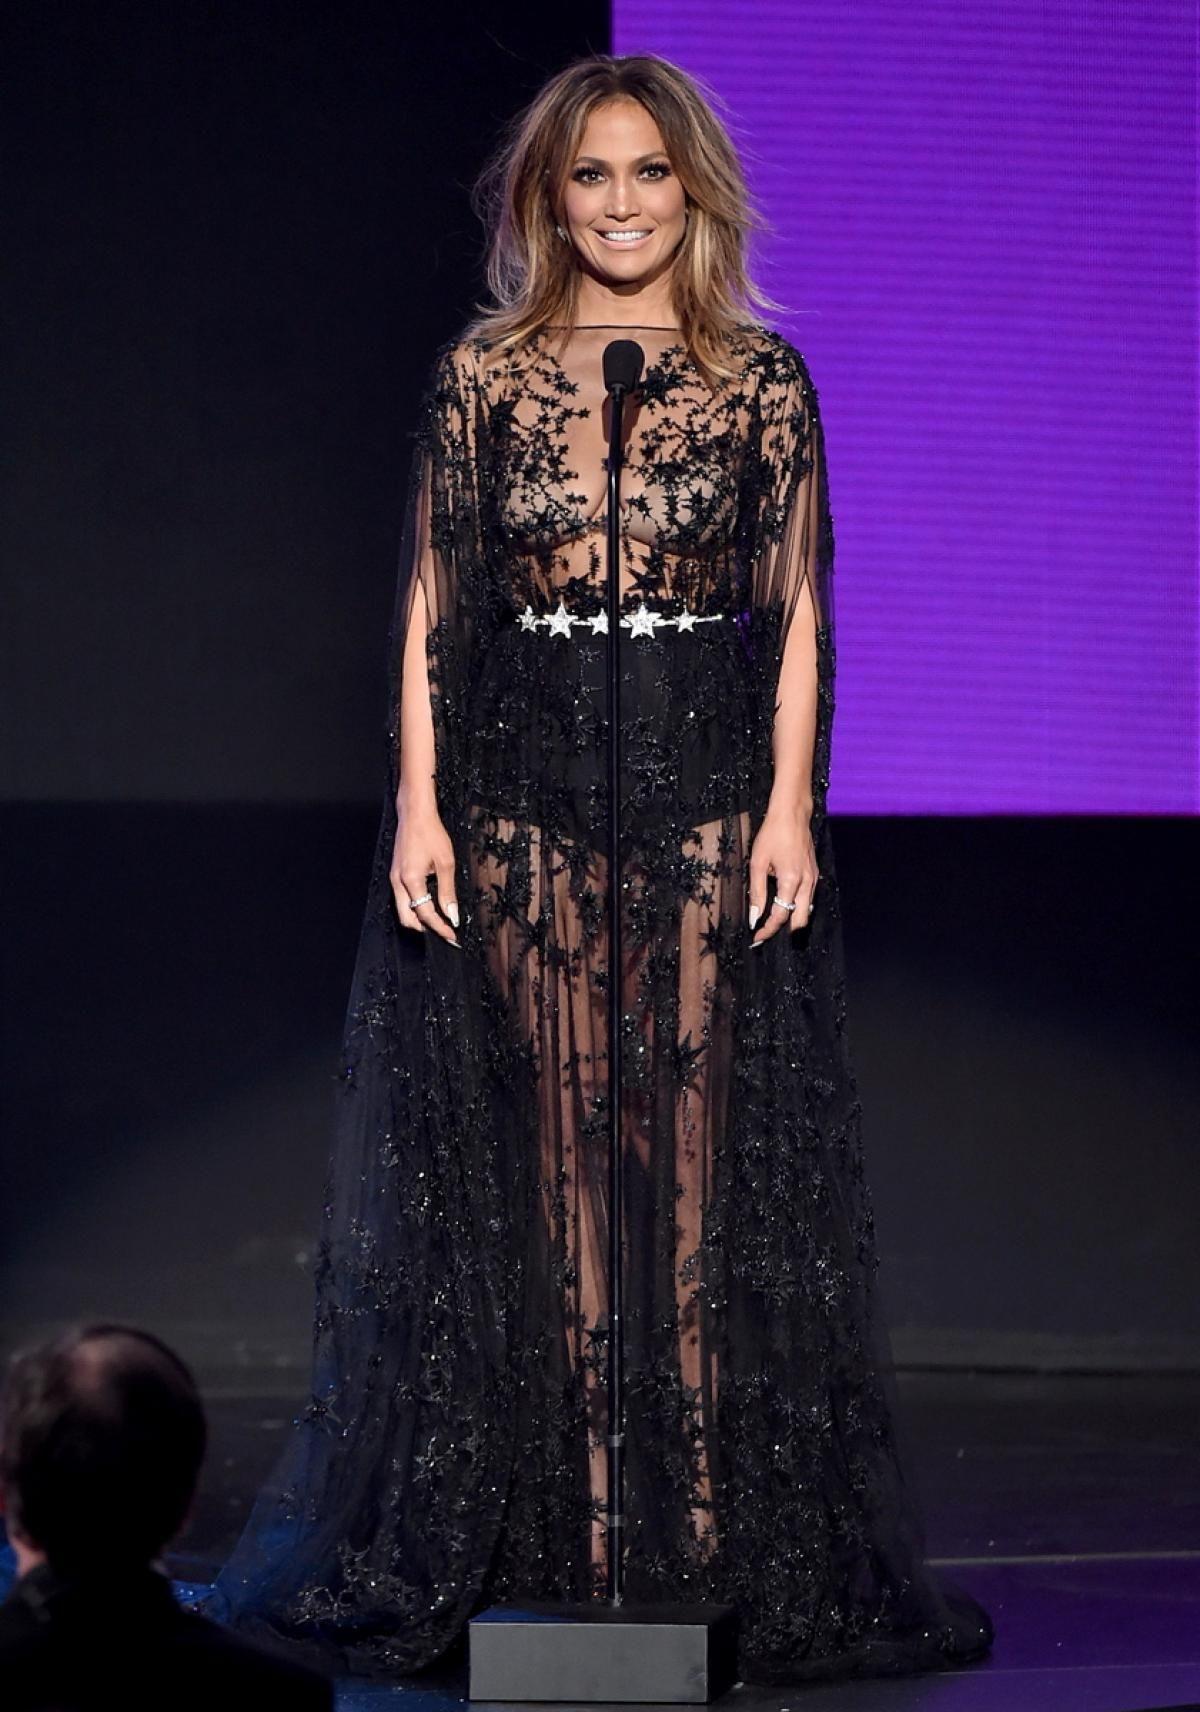 Jennifer Lopez Rocks So Many Different Looks at the AMAs